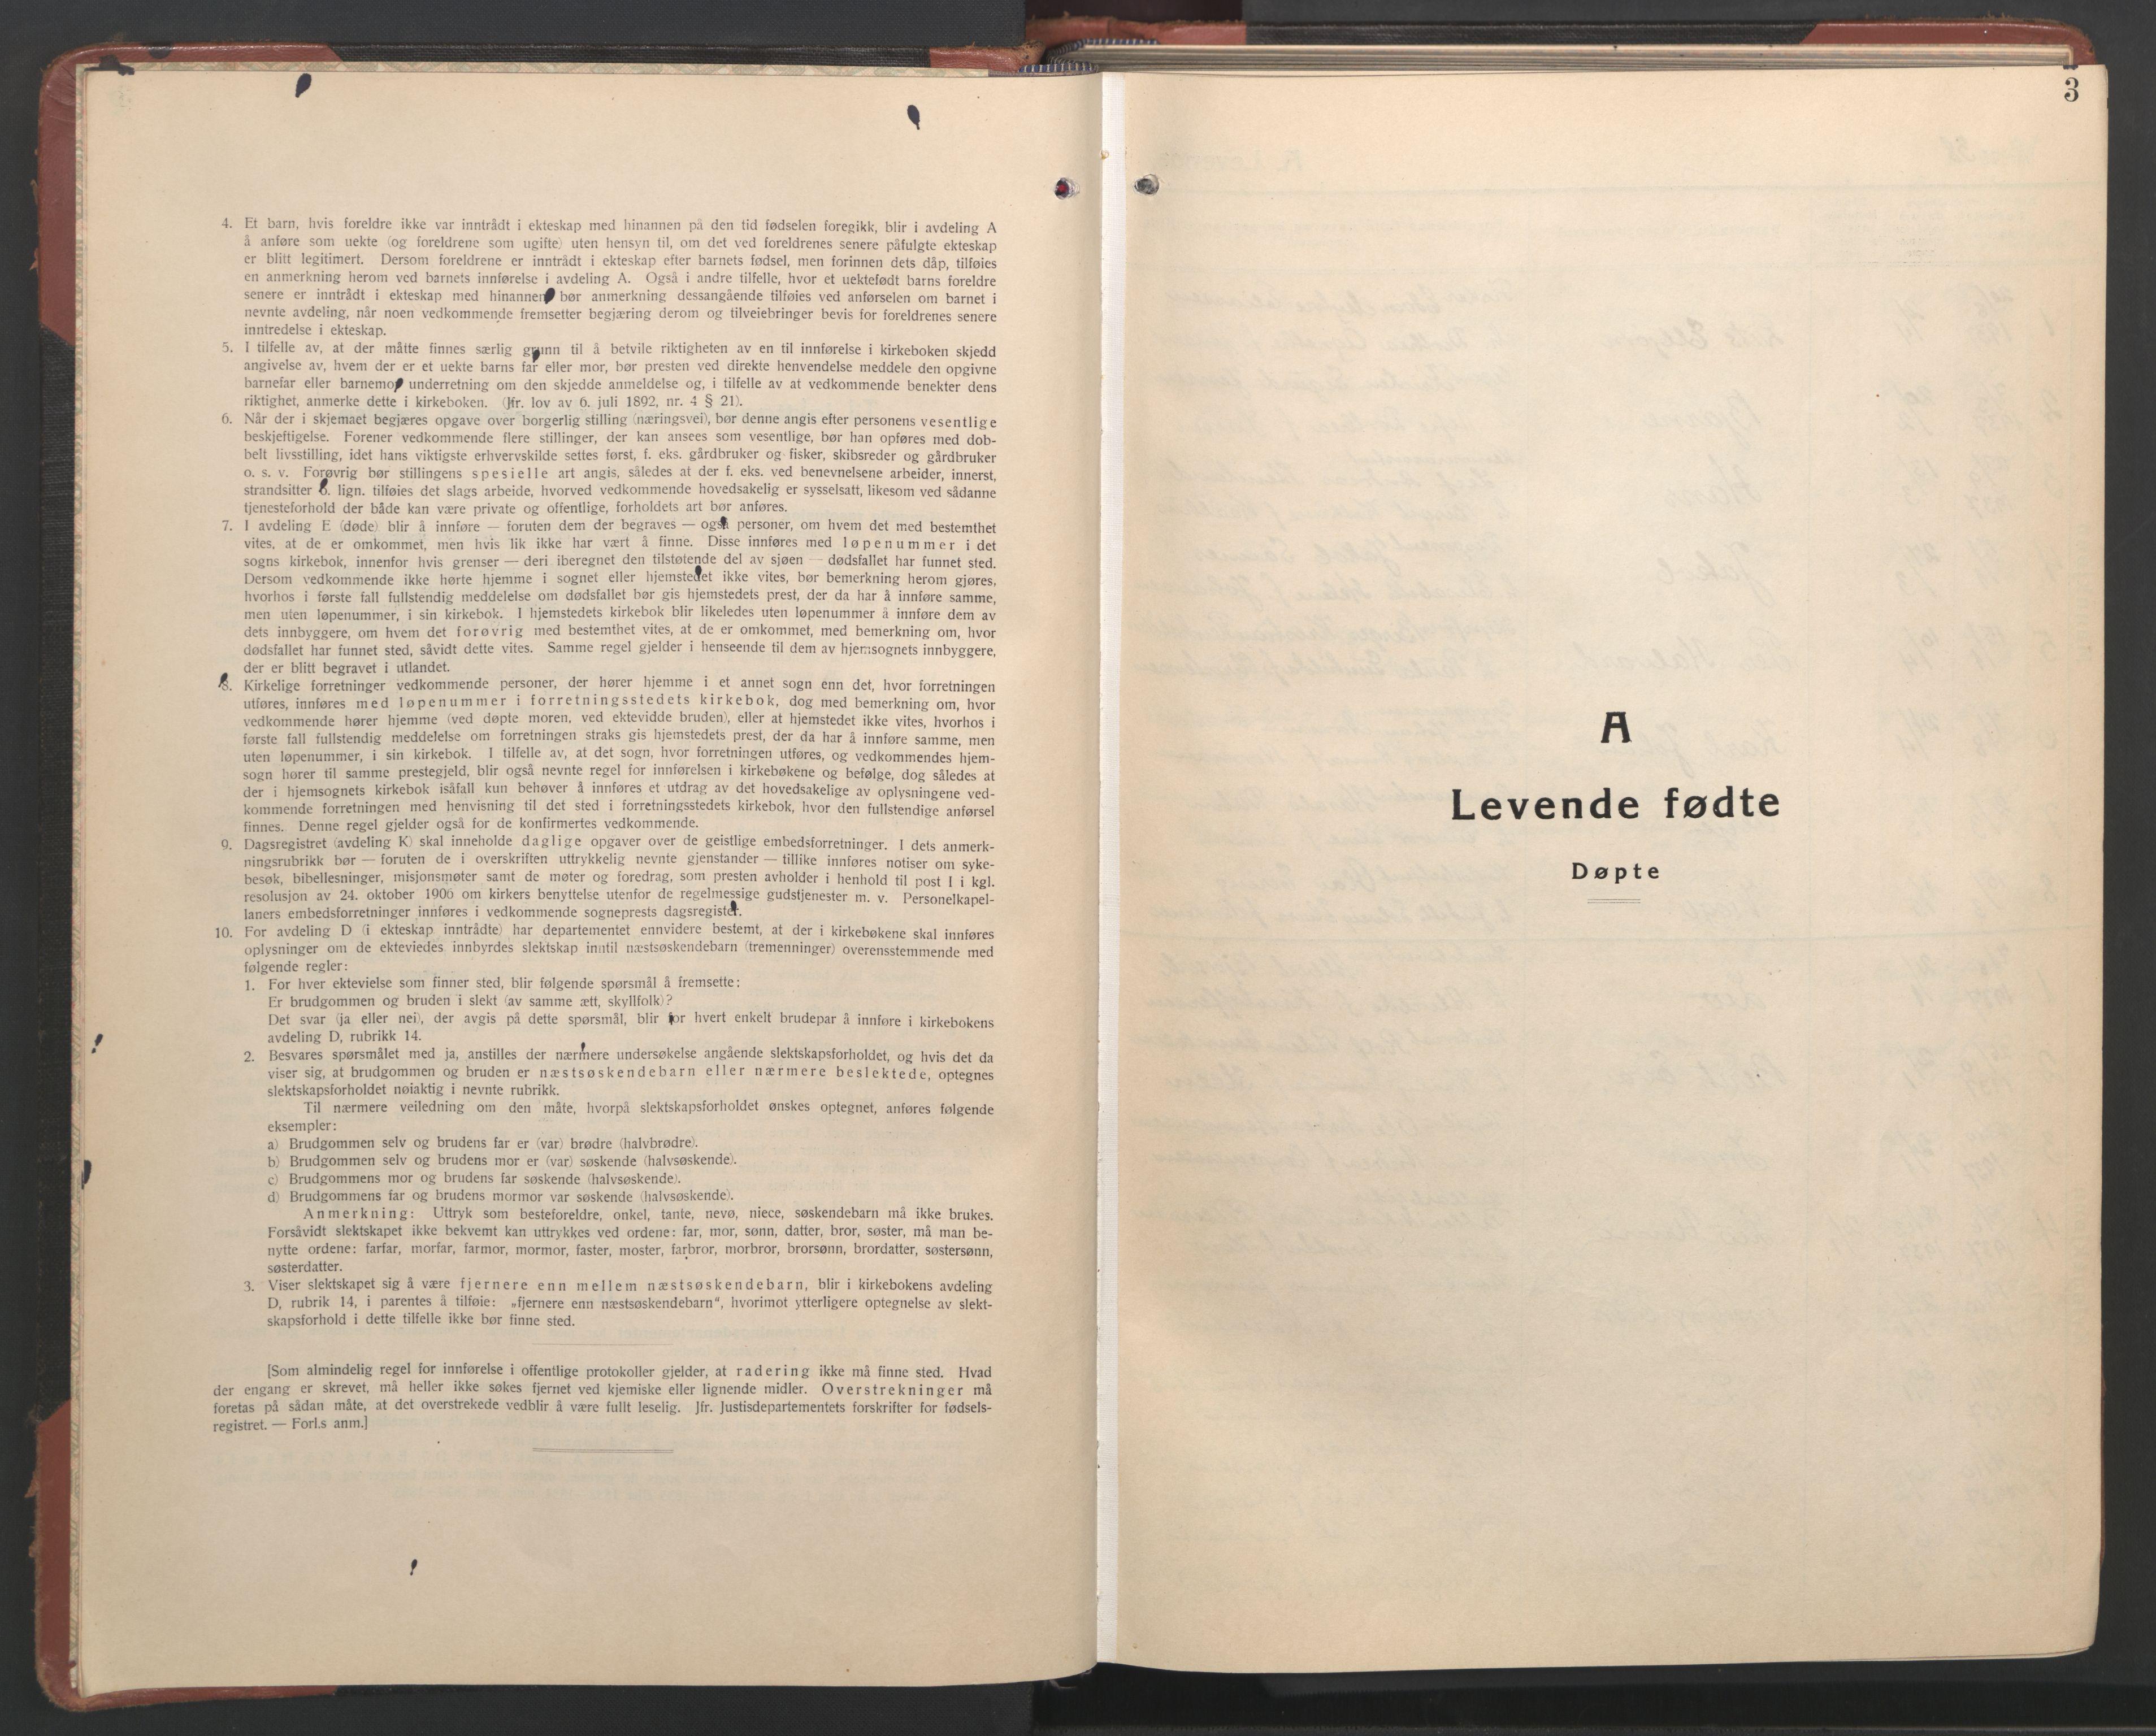 SAT, Ministerialprotokoller, klokkerbøker og fødselsregistre - Nordland, 801/L0039: Klokkerbok nr. 801C14, 1937-1951, s. 3